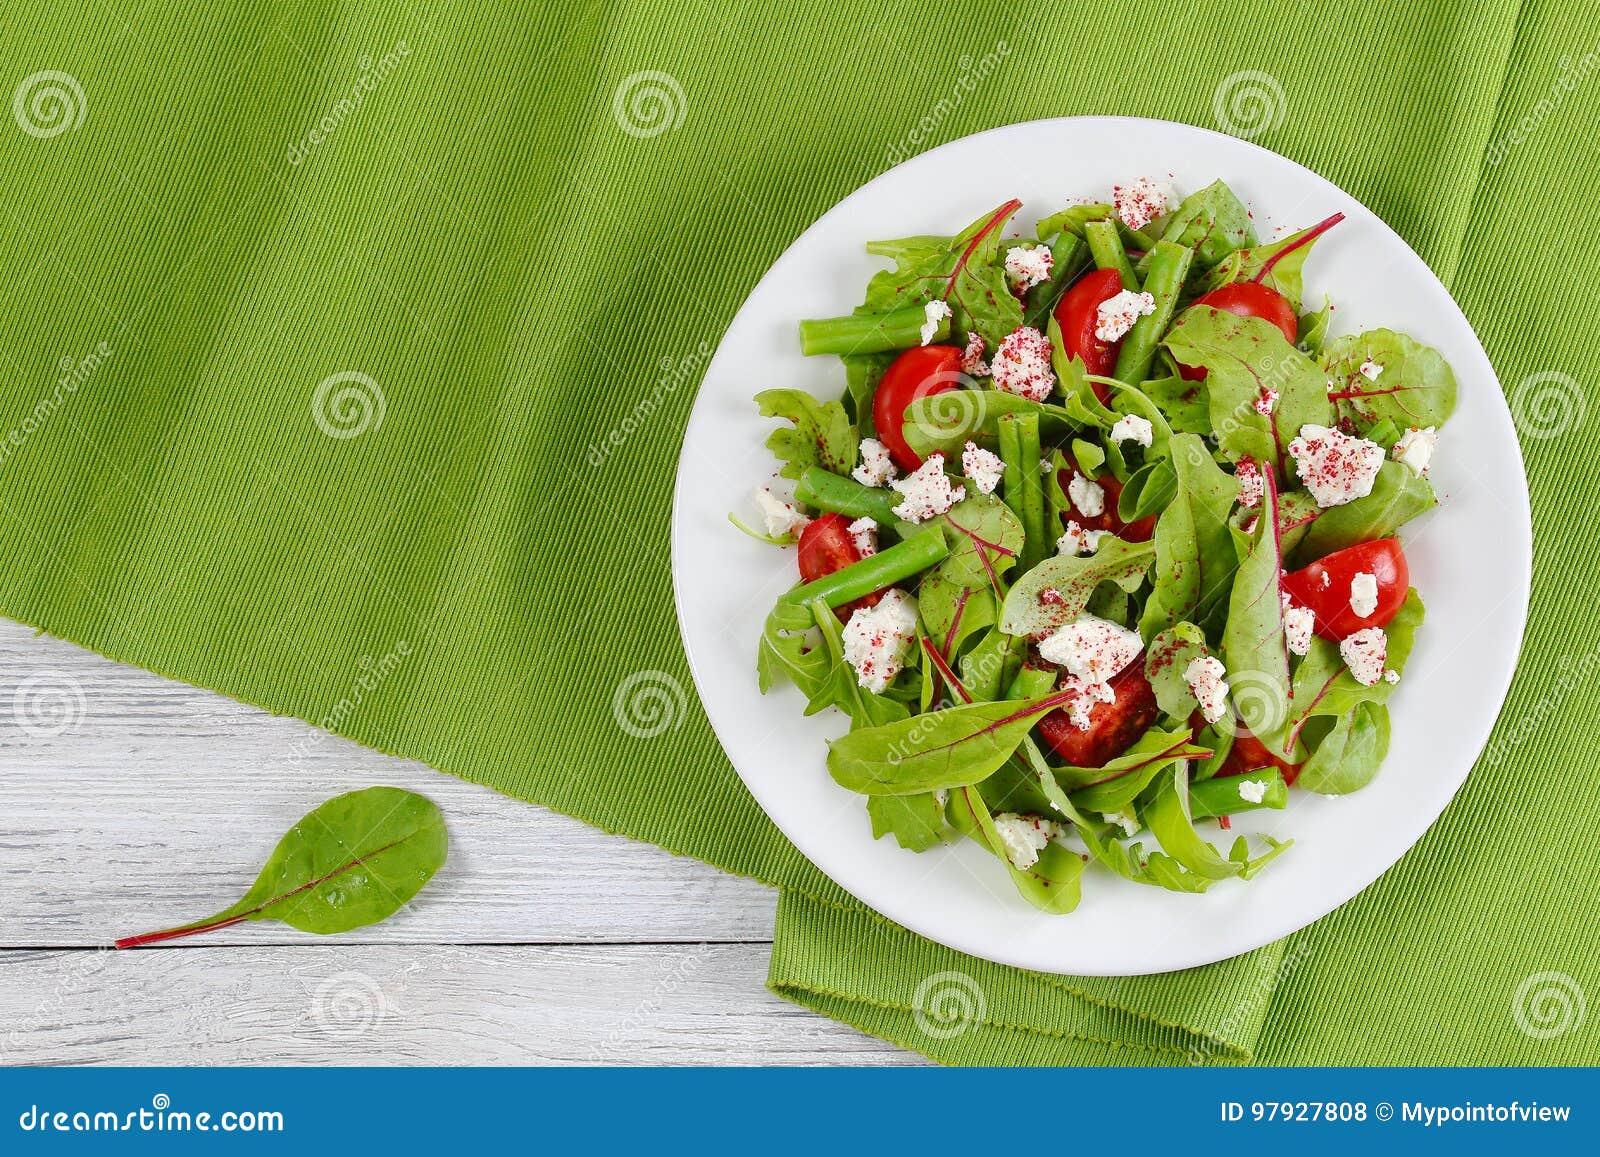 Brilliant Delicious Healthy Low Calories Vegetarian Salad Stock Photo Interior Design Ideas Clesiryabchikinfo